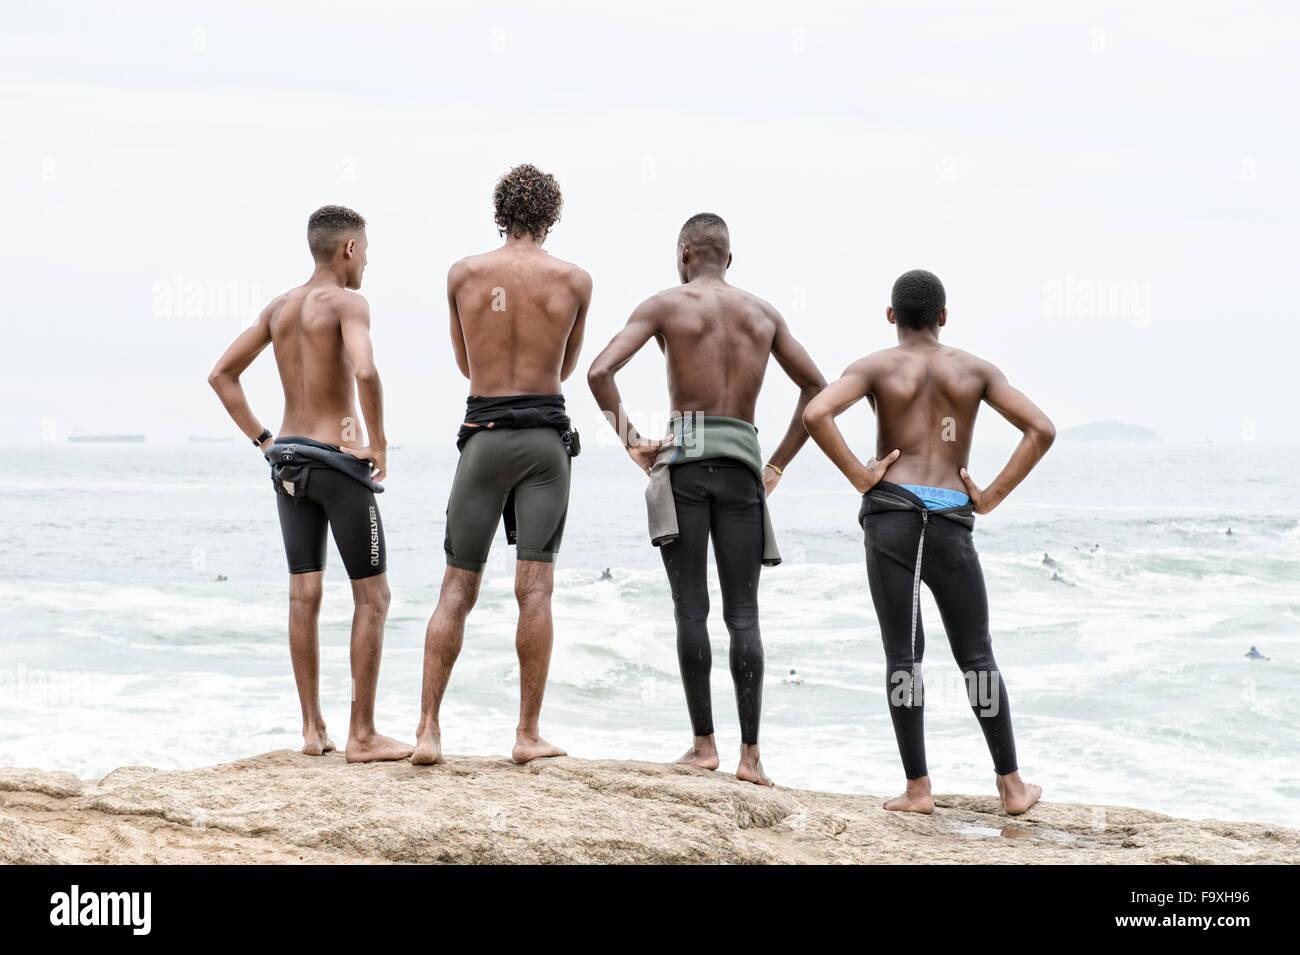 RIO DE JANEIRO, Brasilien - 22. Oktober 2015: Brasilianische Surfer in Neoprenanzüge Blick auf ankommenden Stockbild